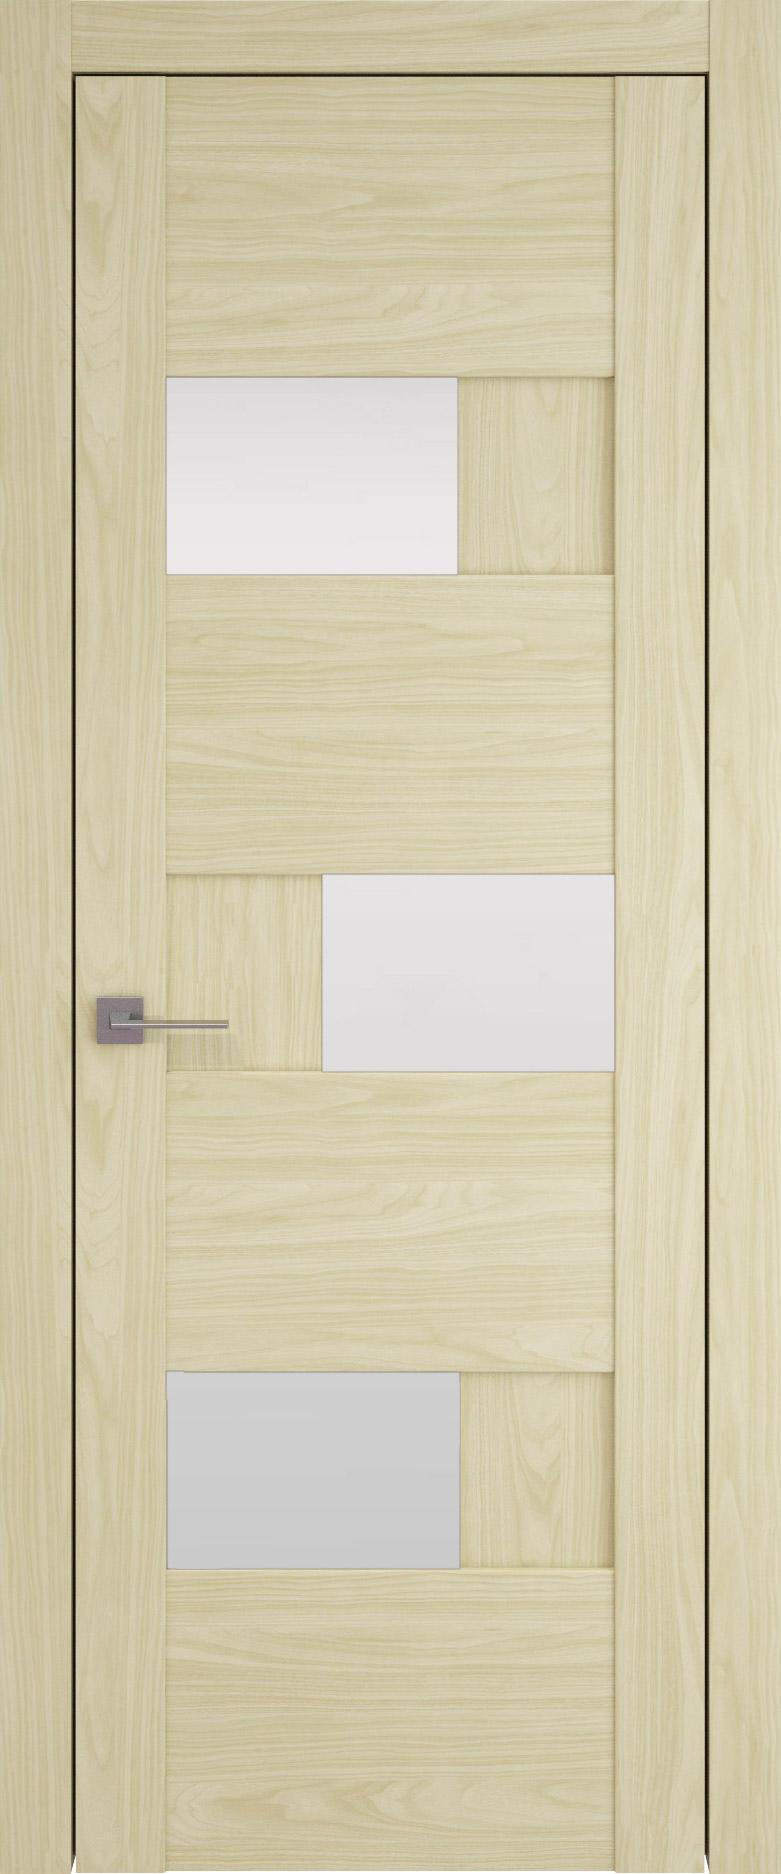 Vicenza цвет - Дуб нордик Со стеклом (ДО)